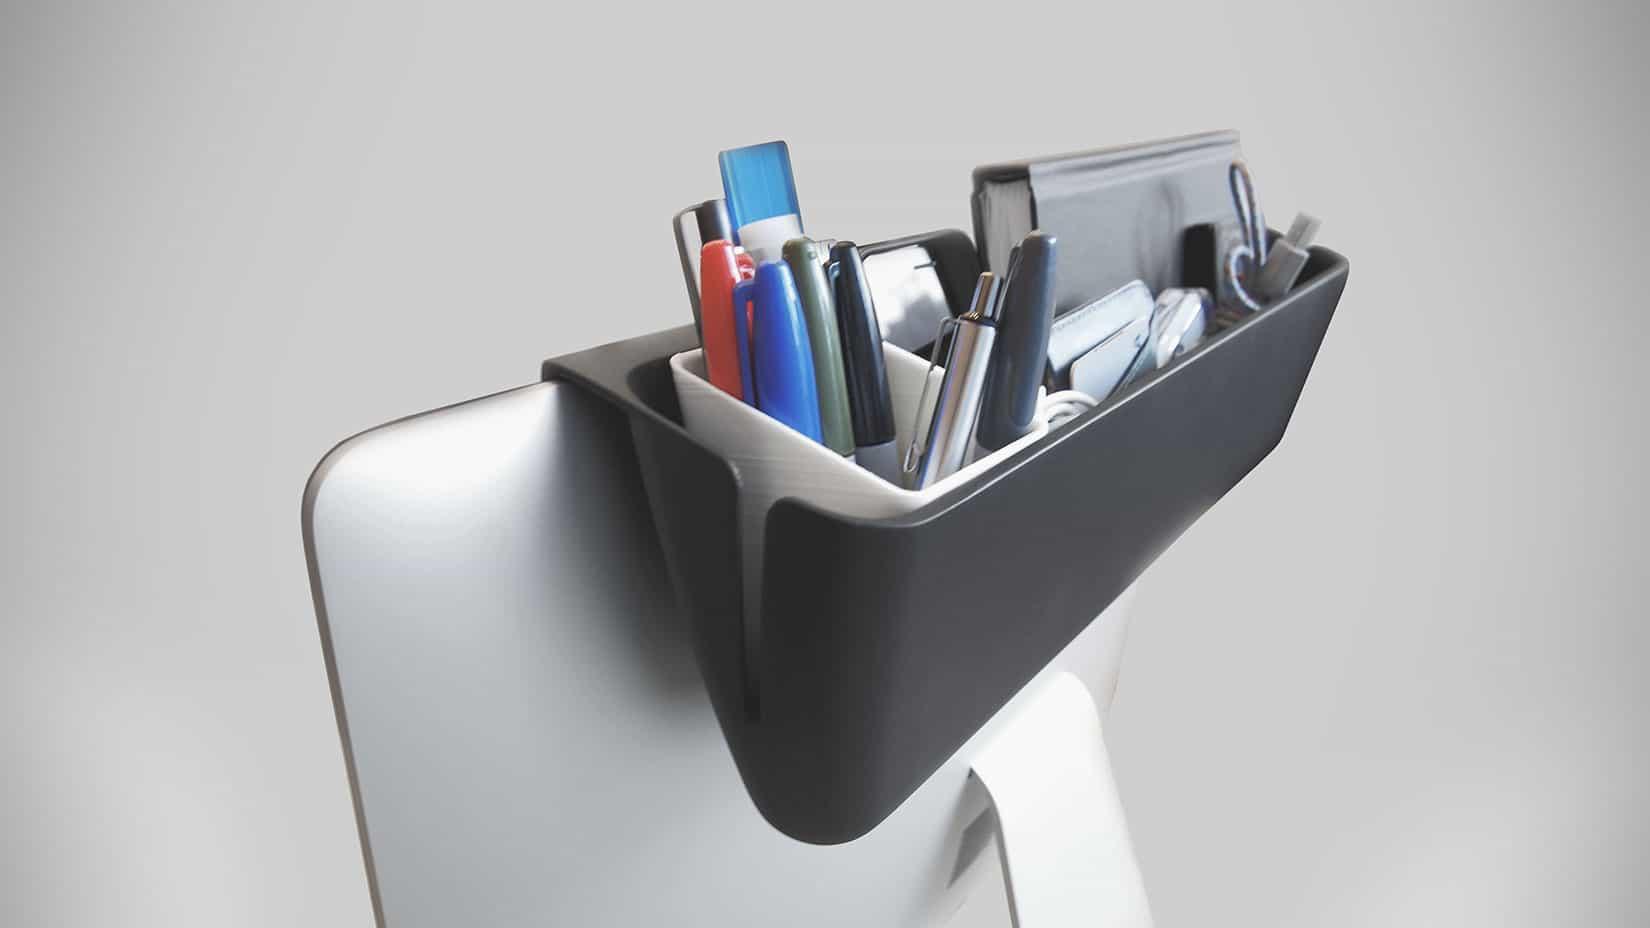 Maqe Mac Caddy iMac accessories